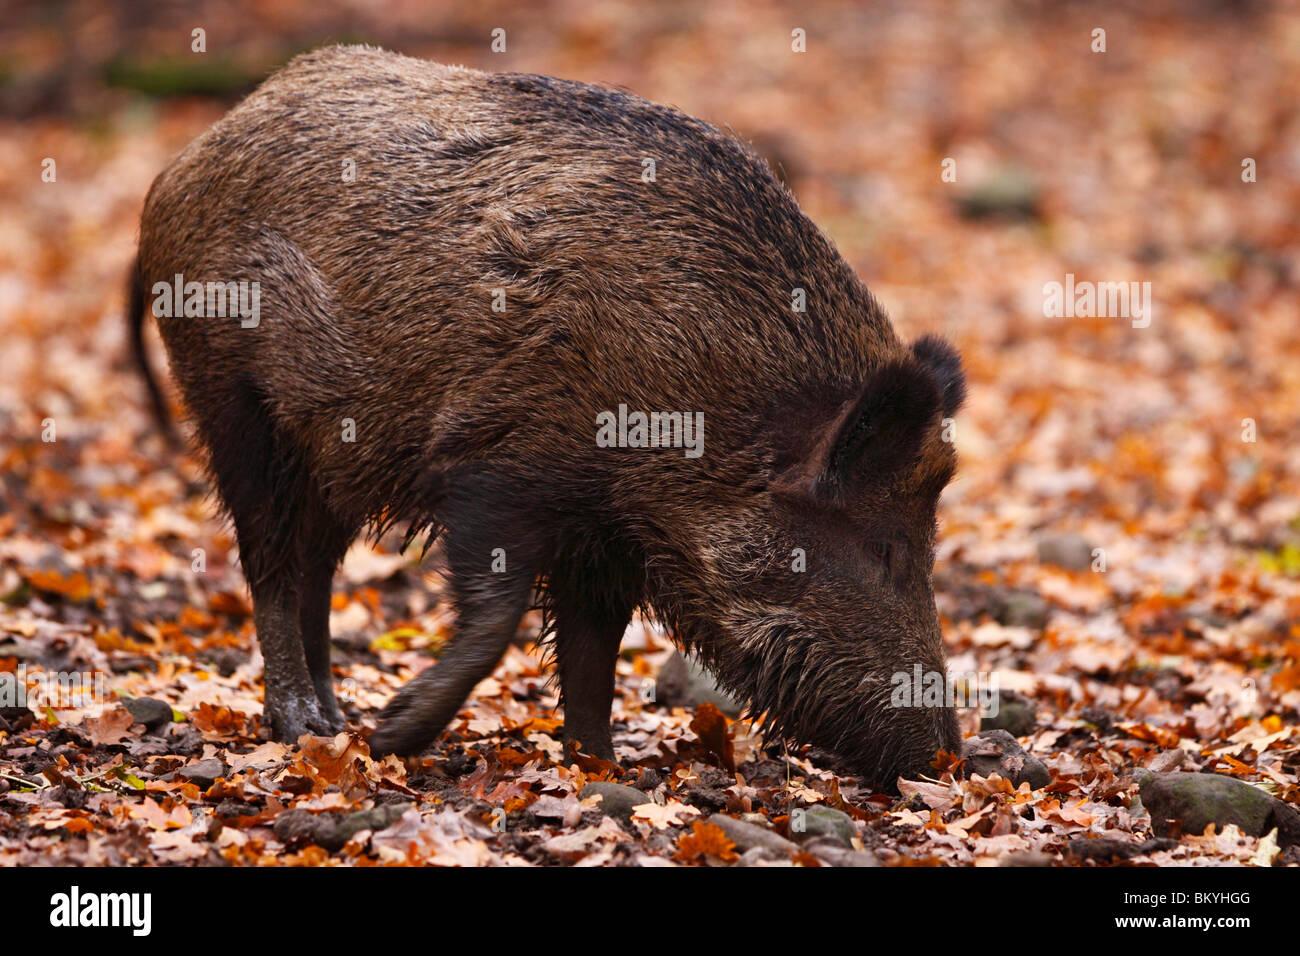 Wildschwein, sus, scrofa, wild, boar, - Stock Image